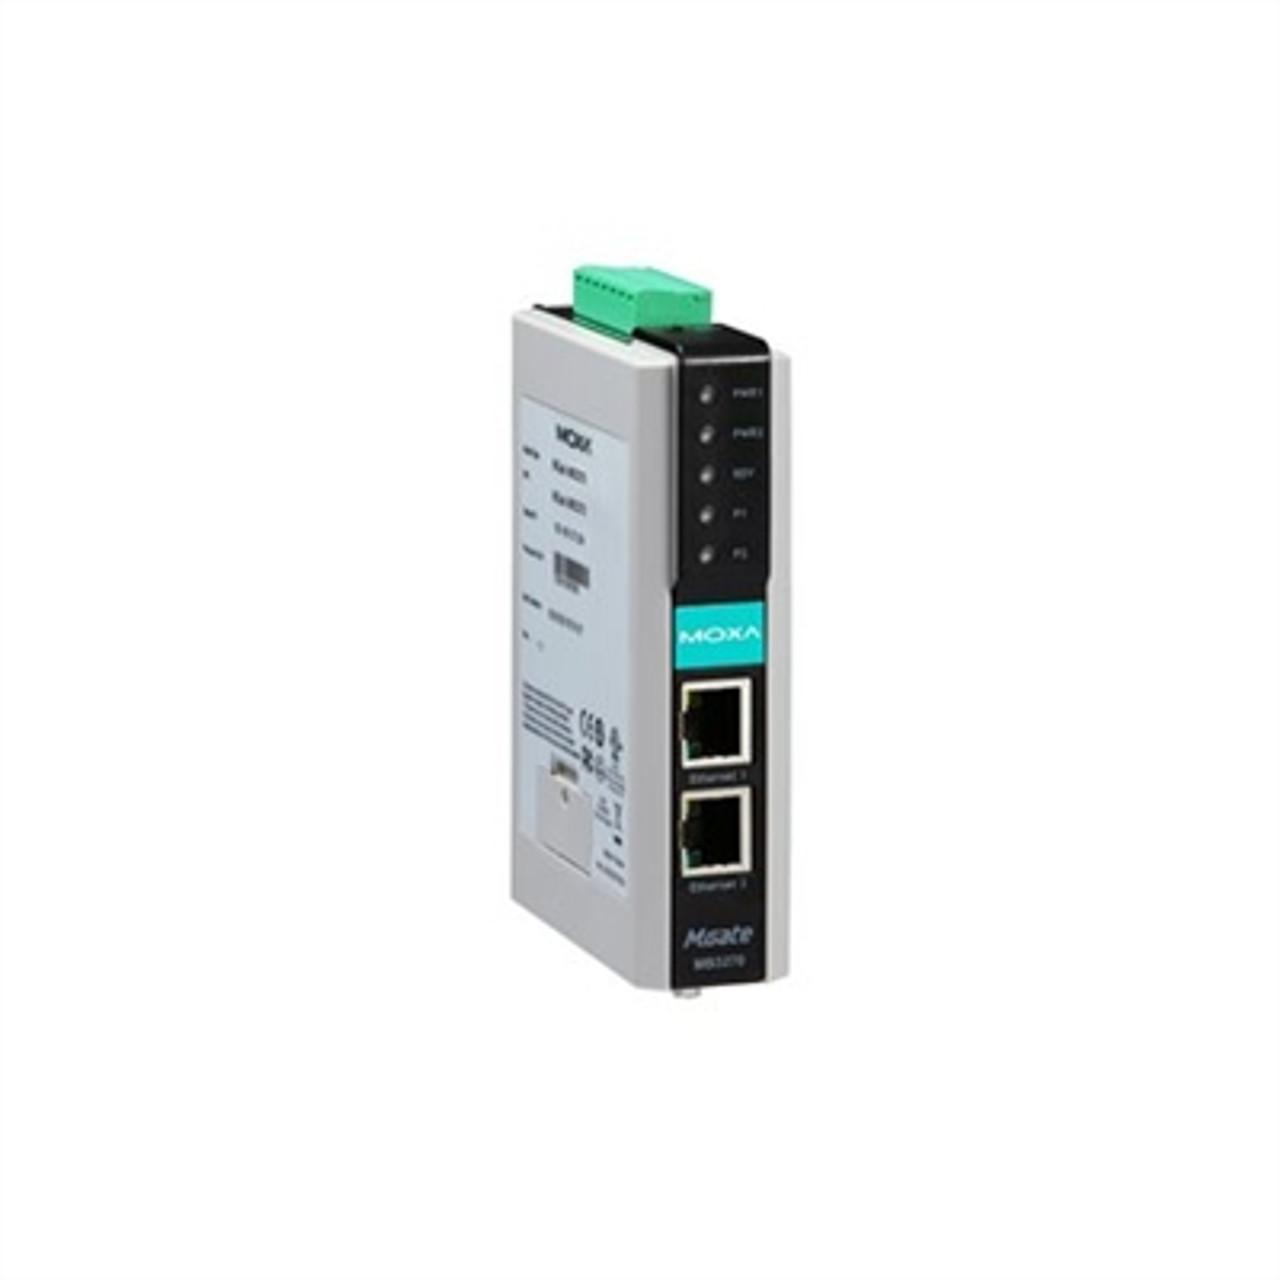 Moxa MGate MB3270I 2-port advanced Modbus gateway